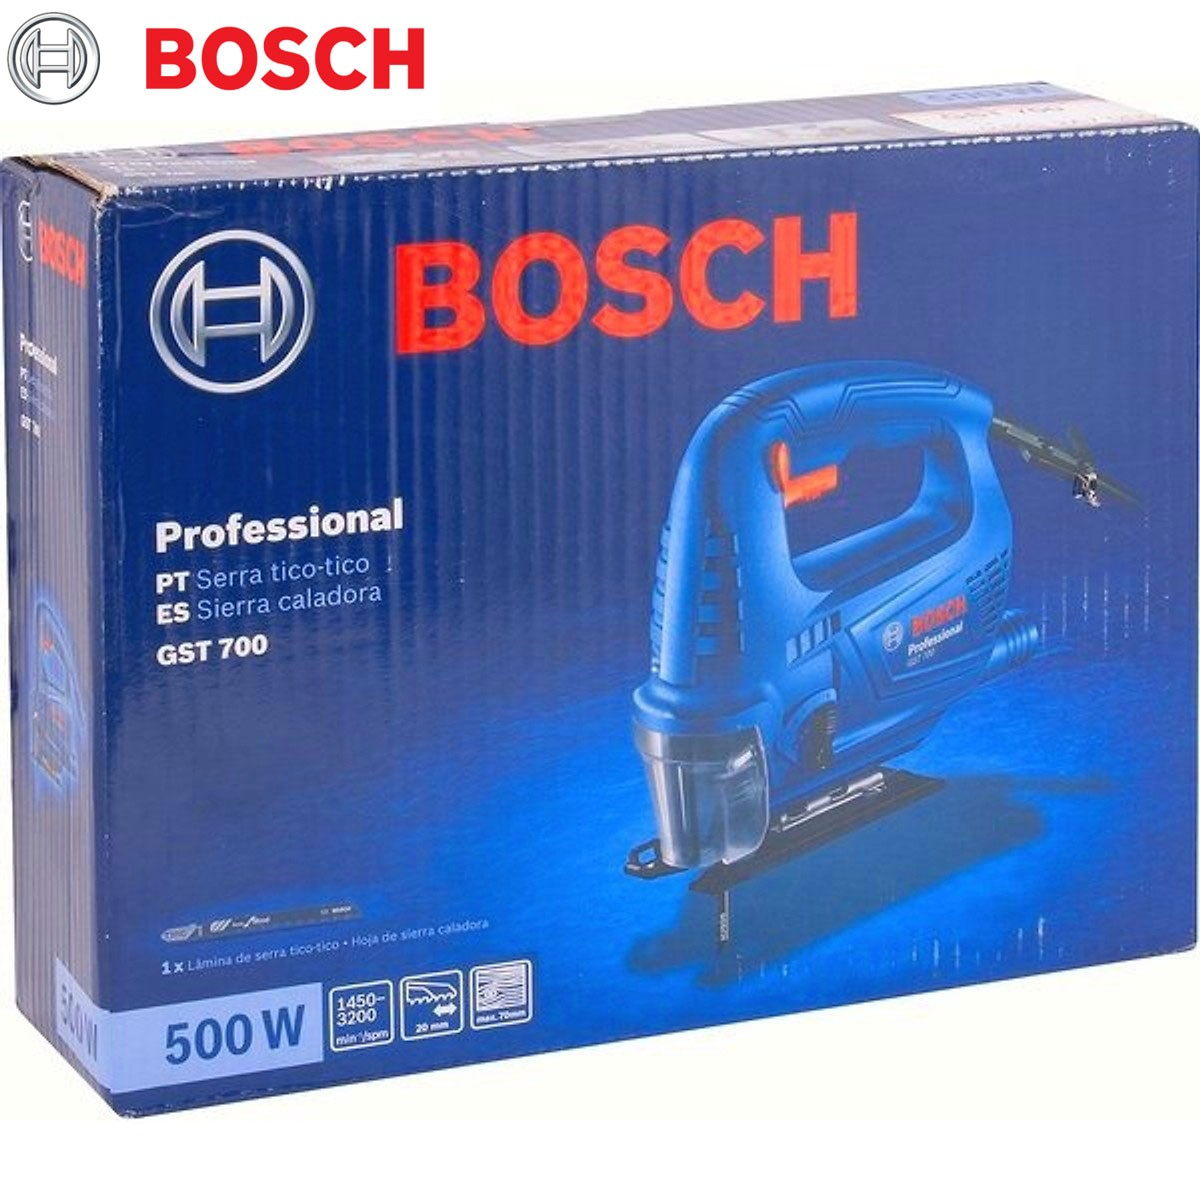 MÁY CƯA LỌNG 500W BOSCH - GST700